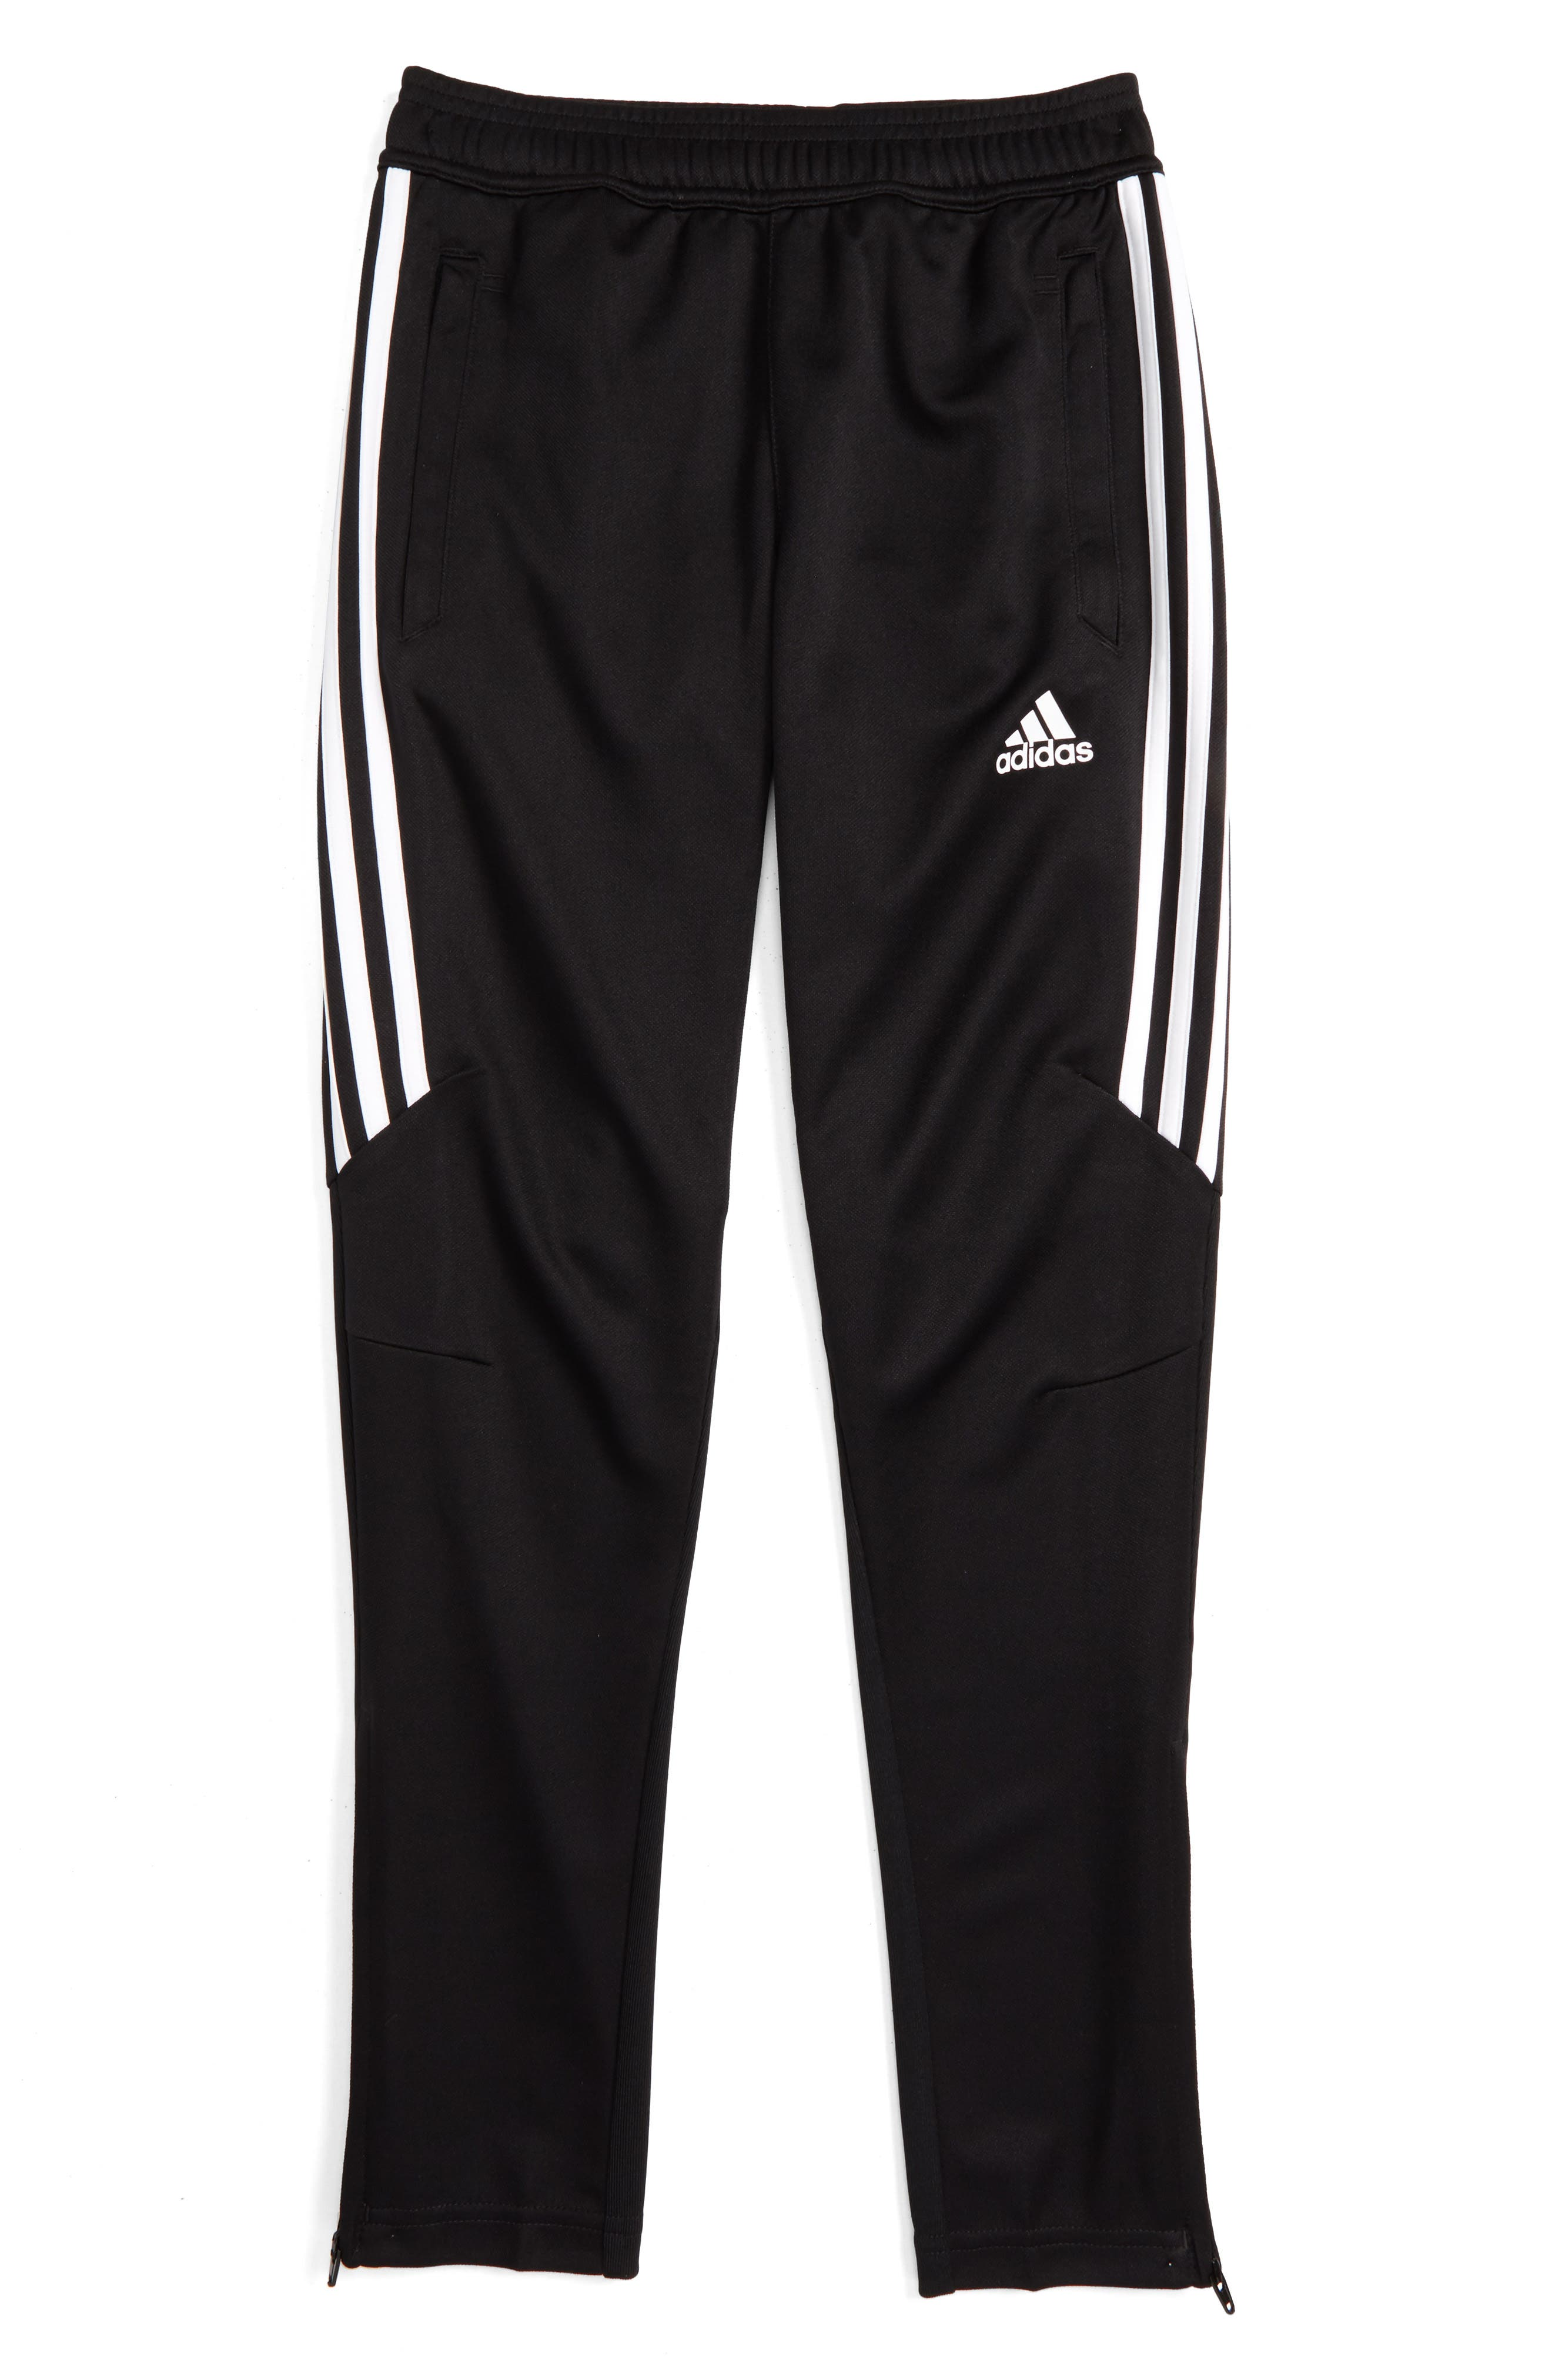 ADIDAS ORIGINALS Tiro 17 Training Pants, Main, color, BLACK/ WHITE/ WHITE